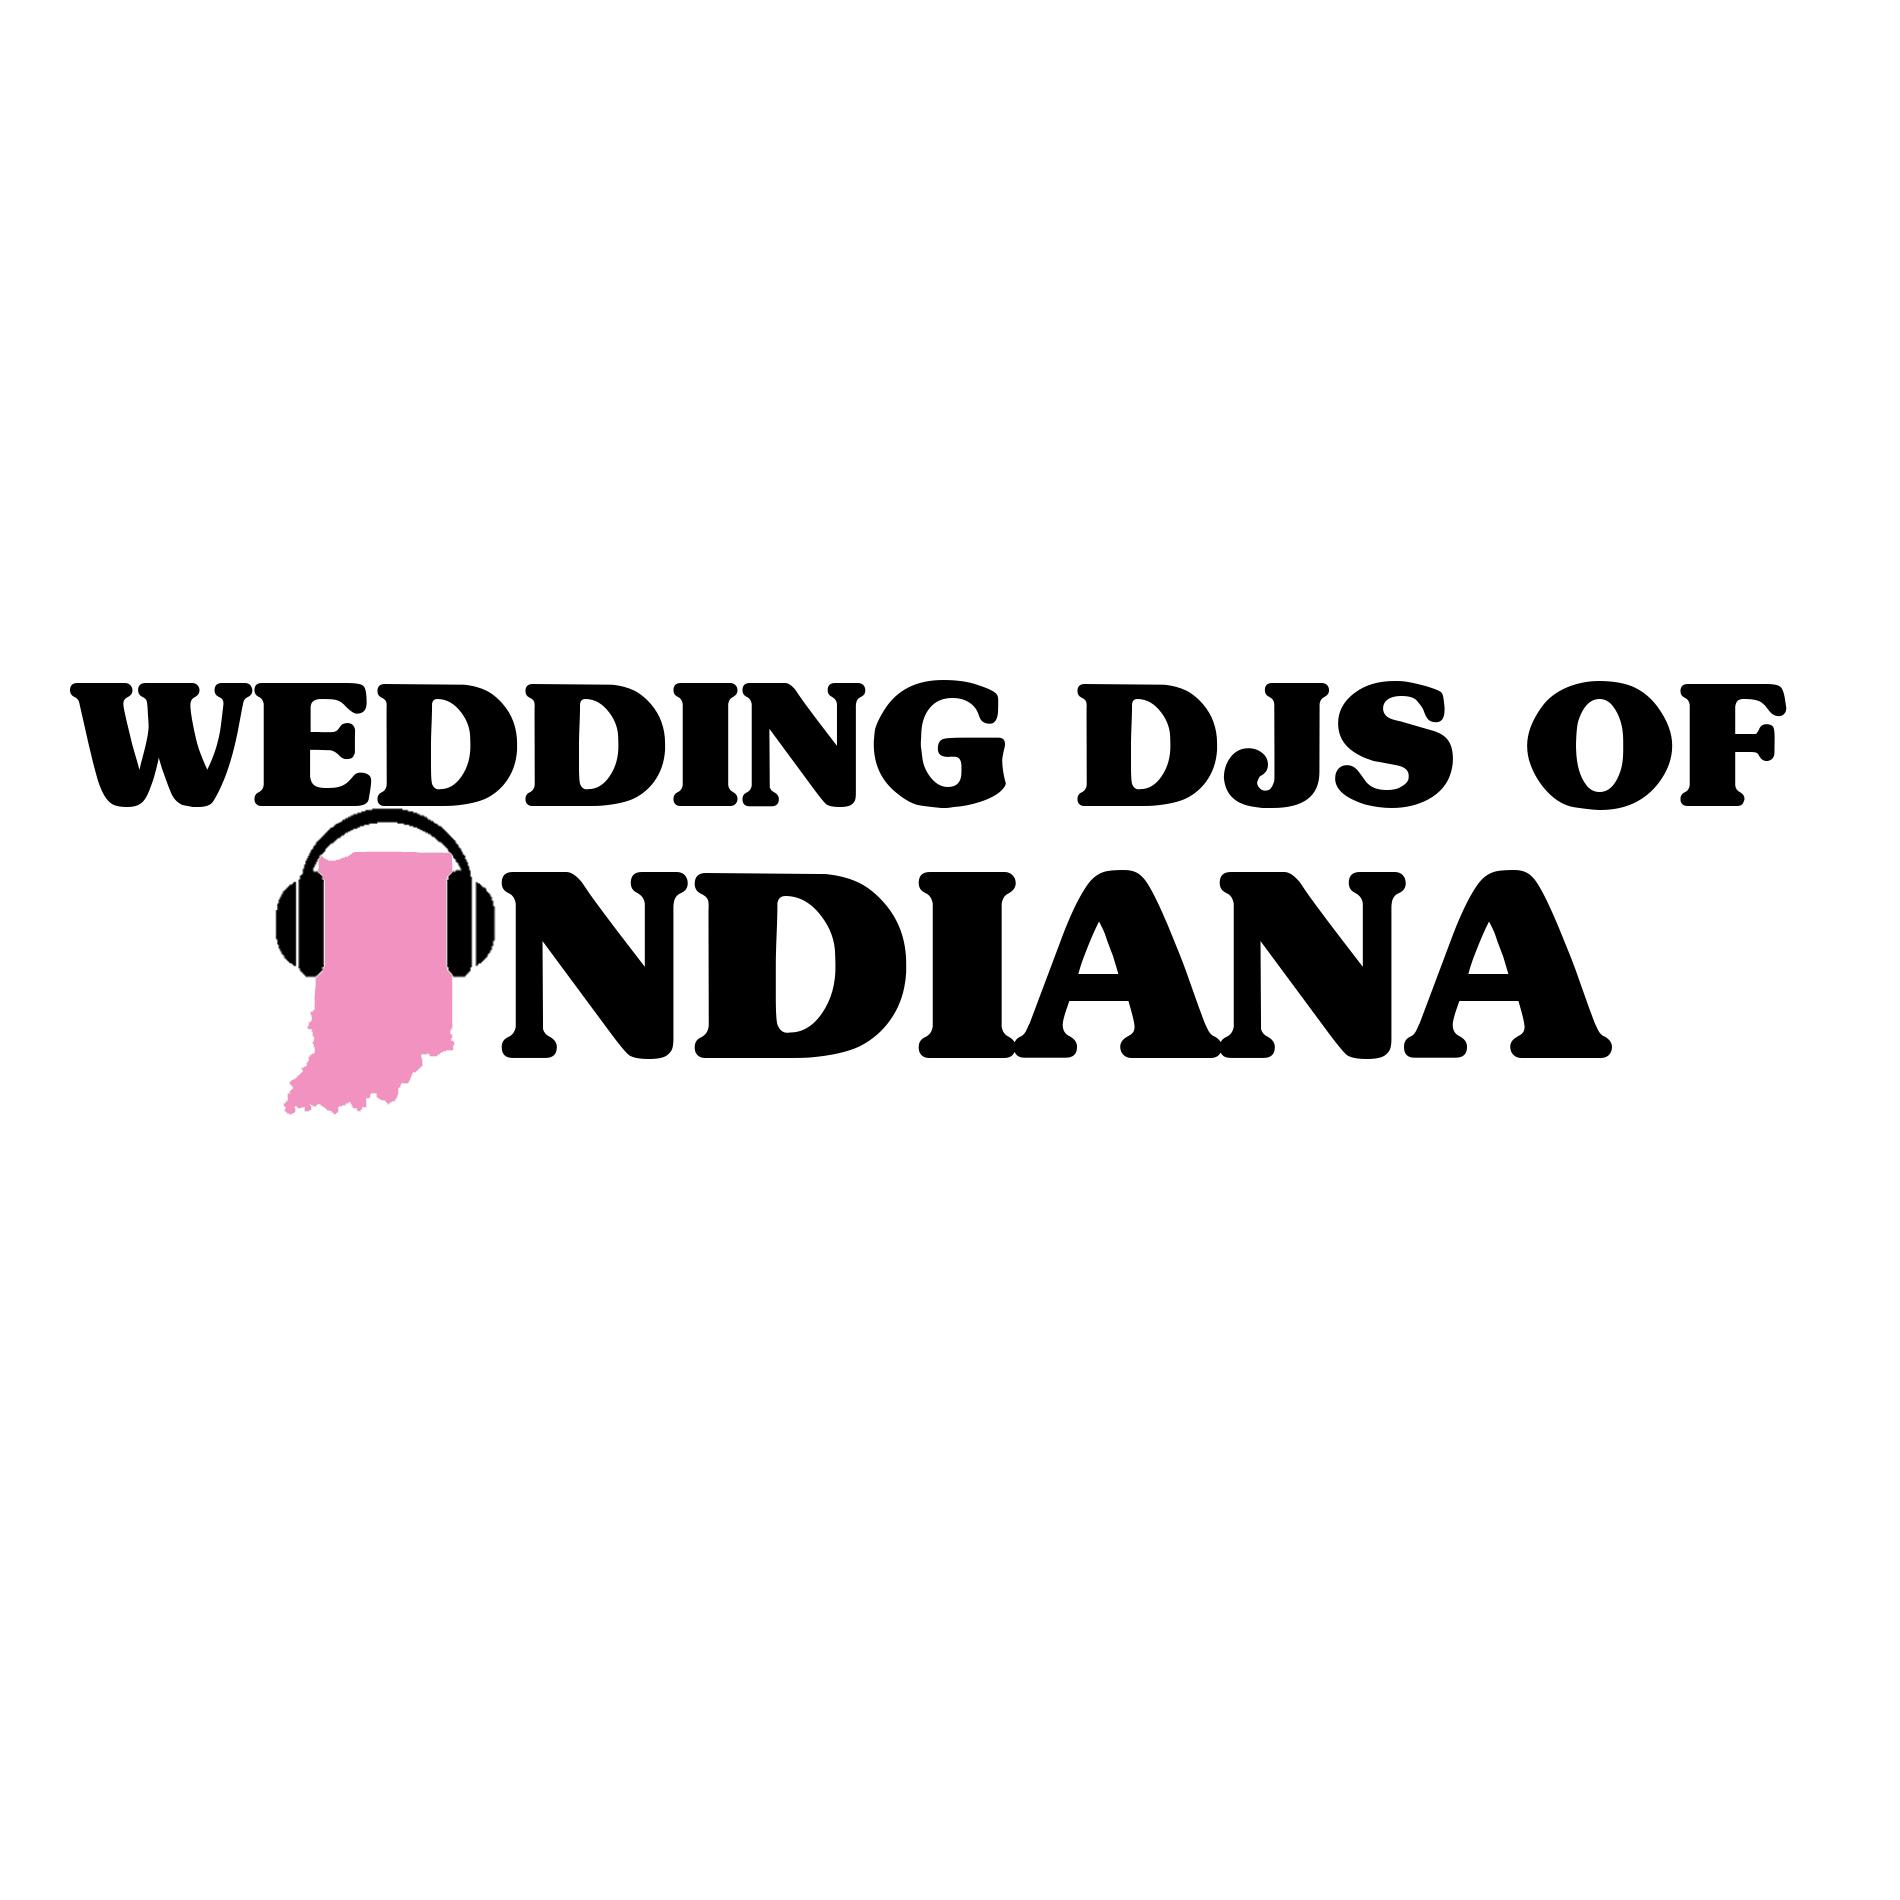 Wedding DJs Of Indiana - Indiana's Professional DJs